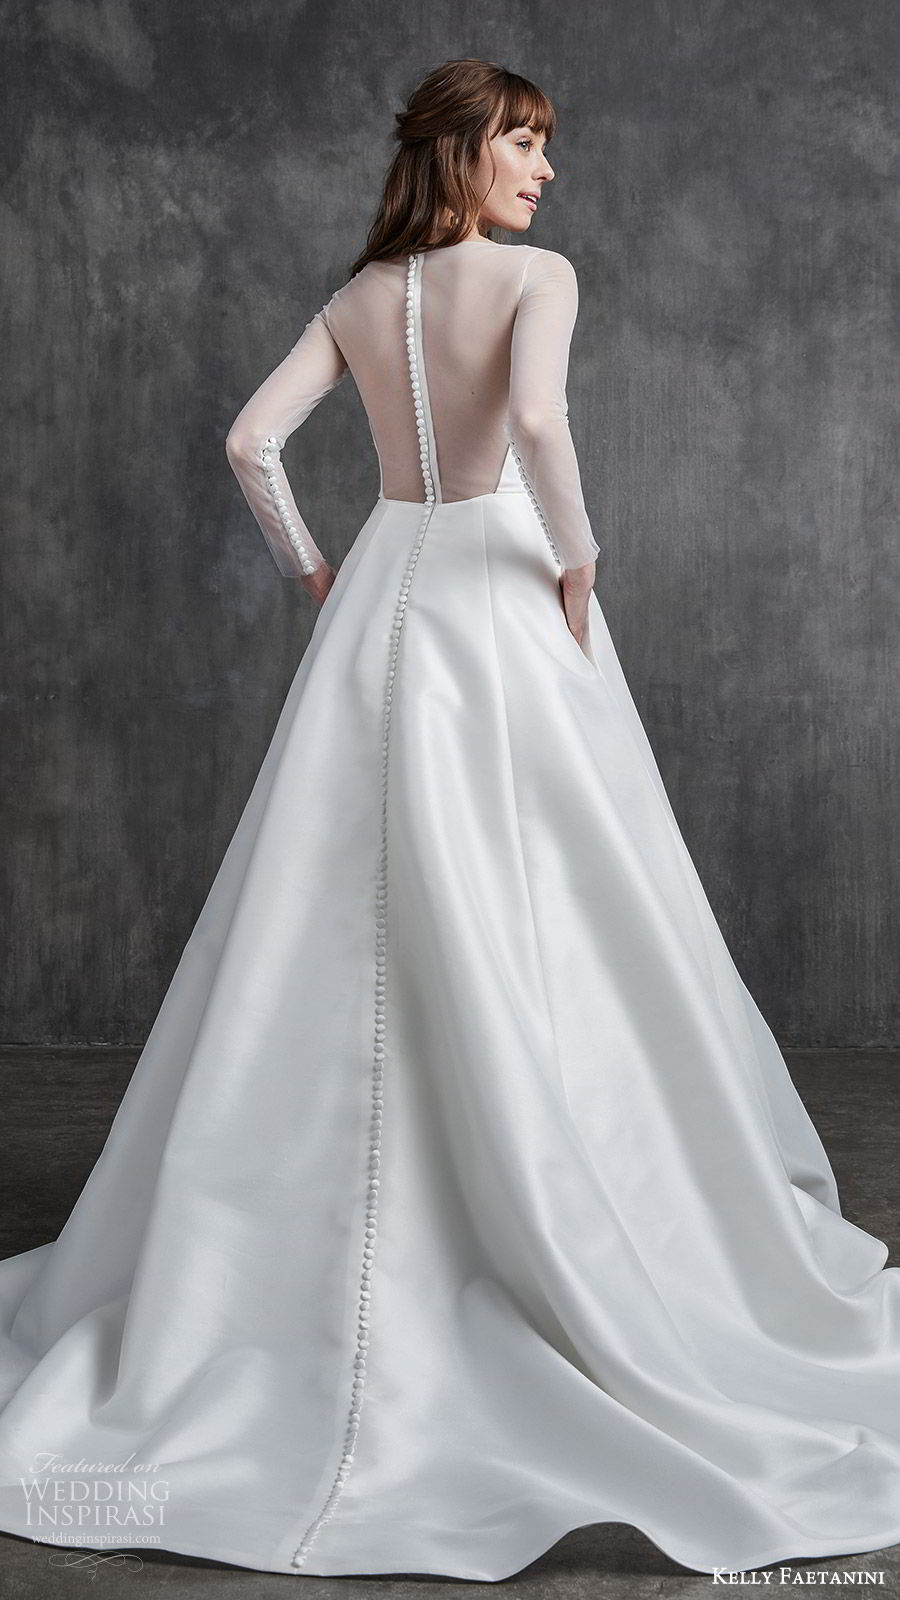 kelly faetanini spring 2020 bridal illusion long sleeves sheer bateau neck split sweetheart neckline a line ball gown wedding dress (4) princess elegant sheer back chapel train bv